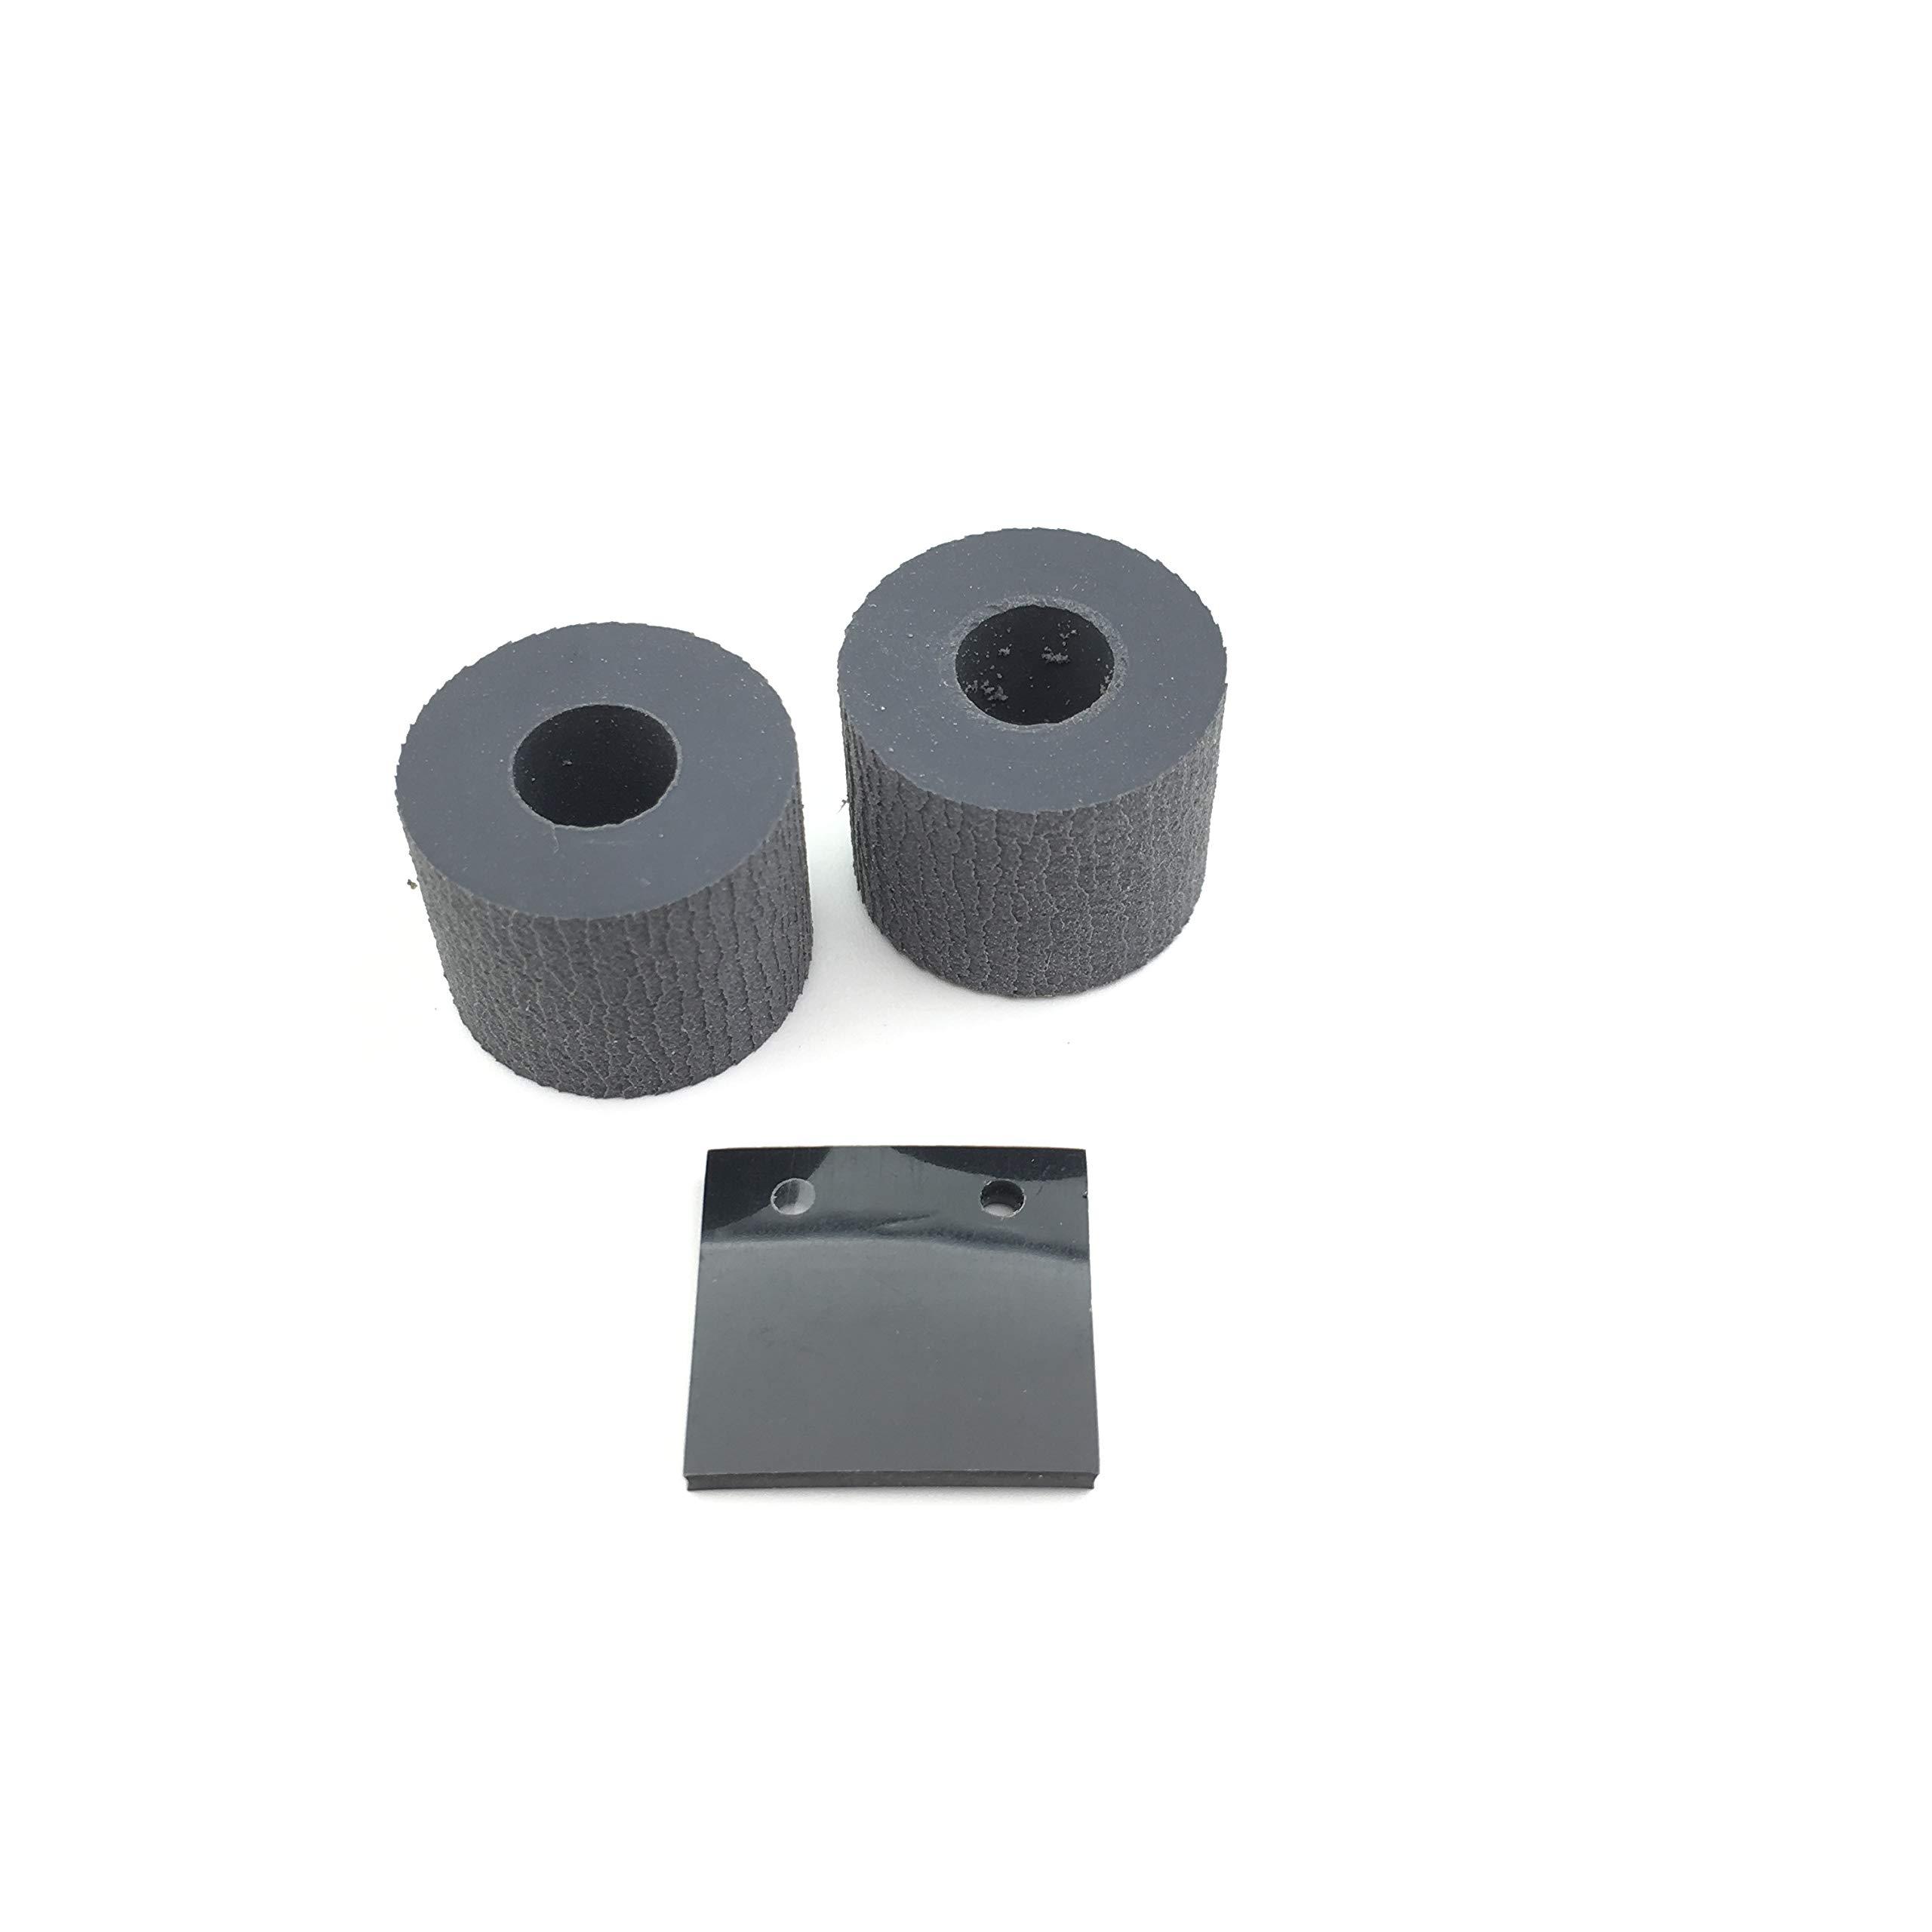 OKLILI PA03541-0001 PA03541-0002 Pick Pickup Roller Tire Separation Pad for Fujitsu ScanSnap S300 S300M S1300 S1300i